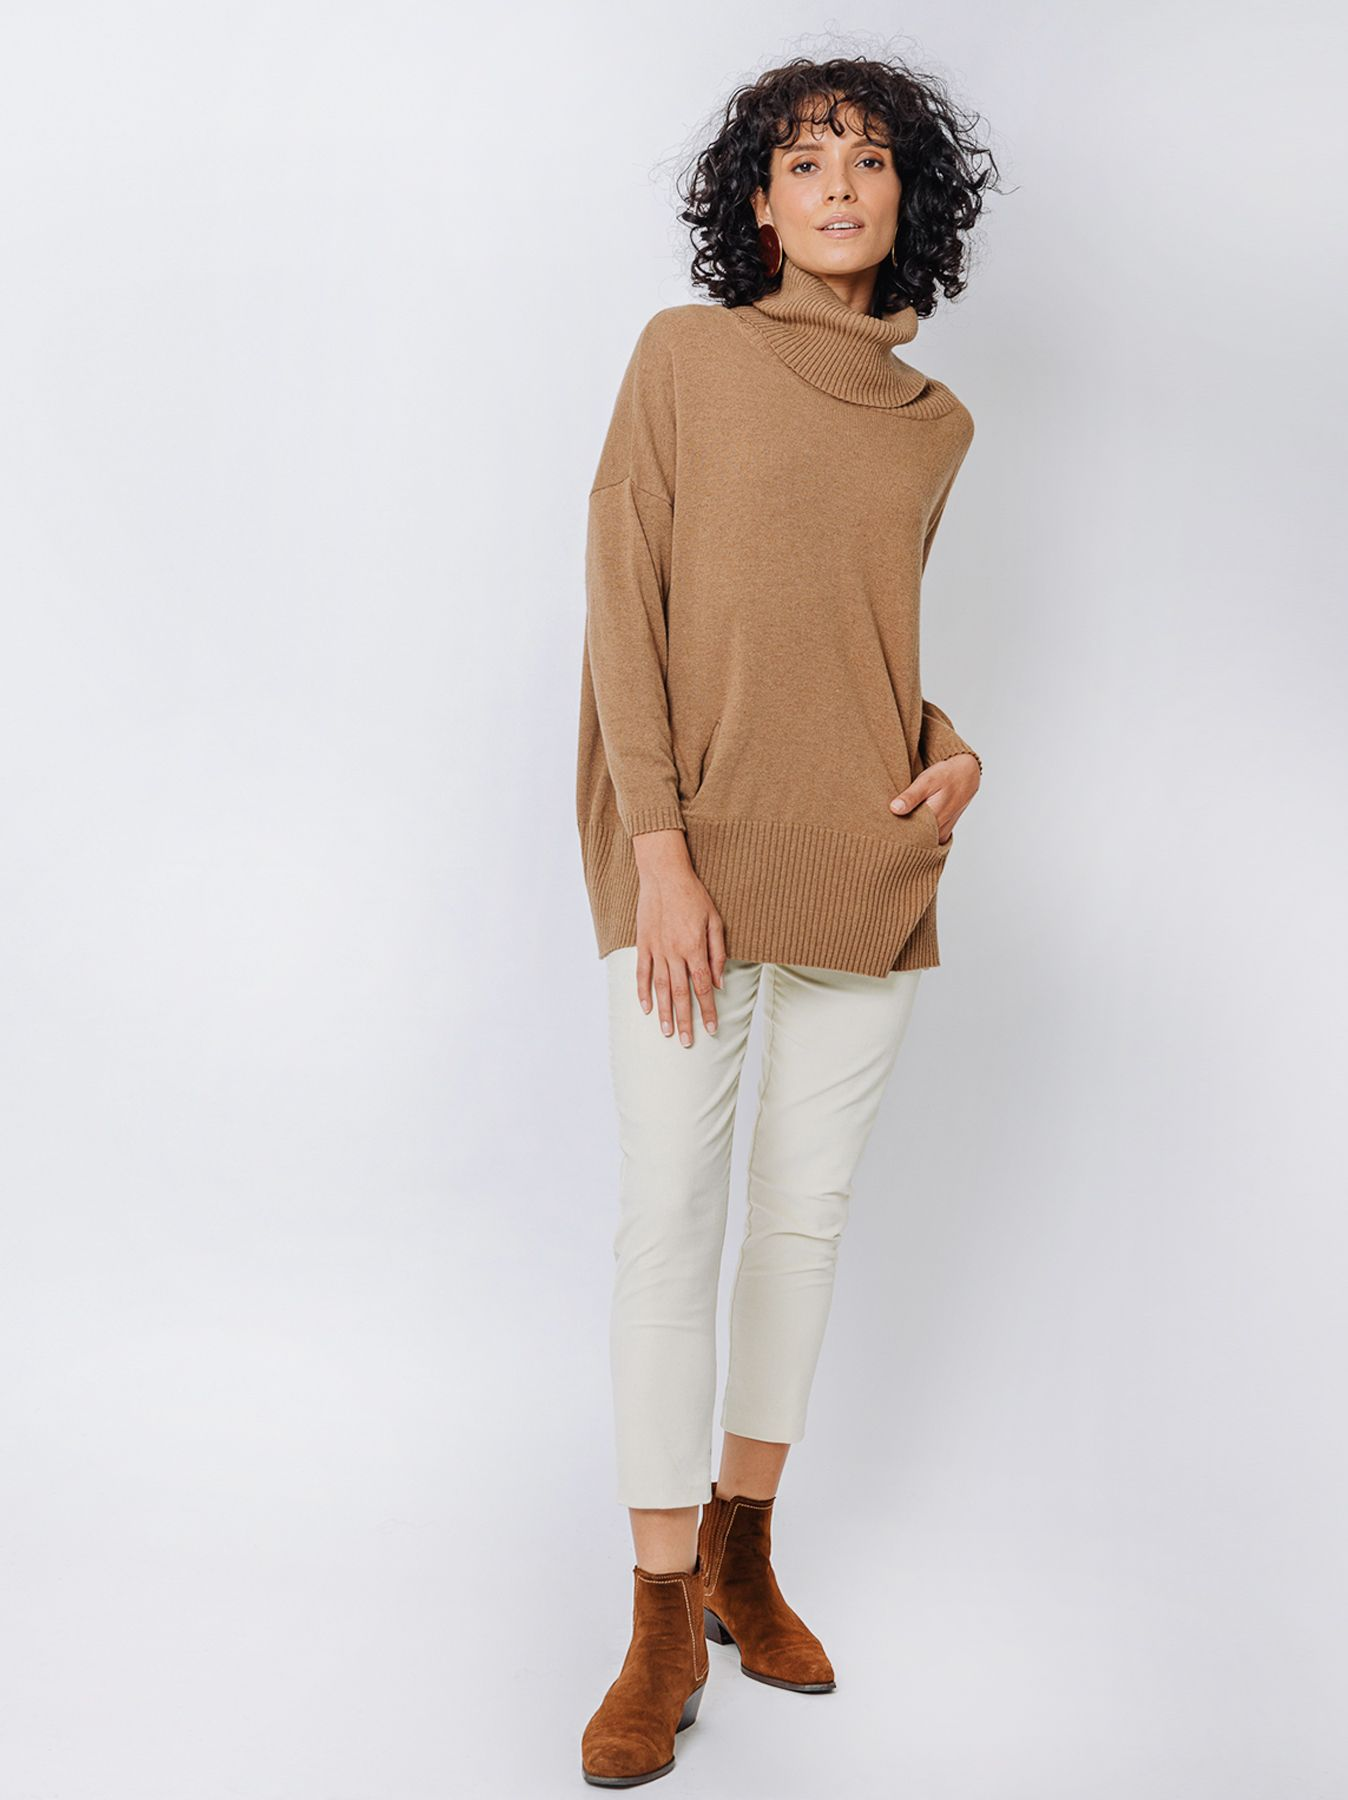 Maxi shirt high neck